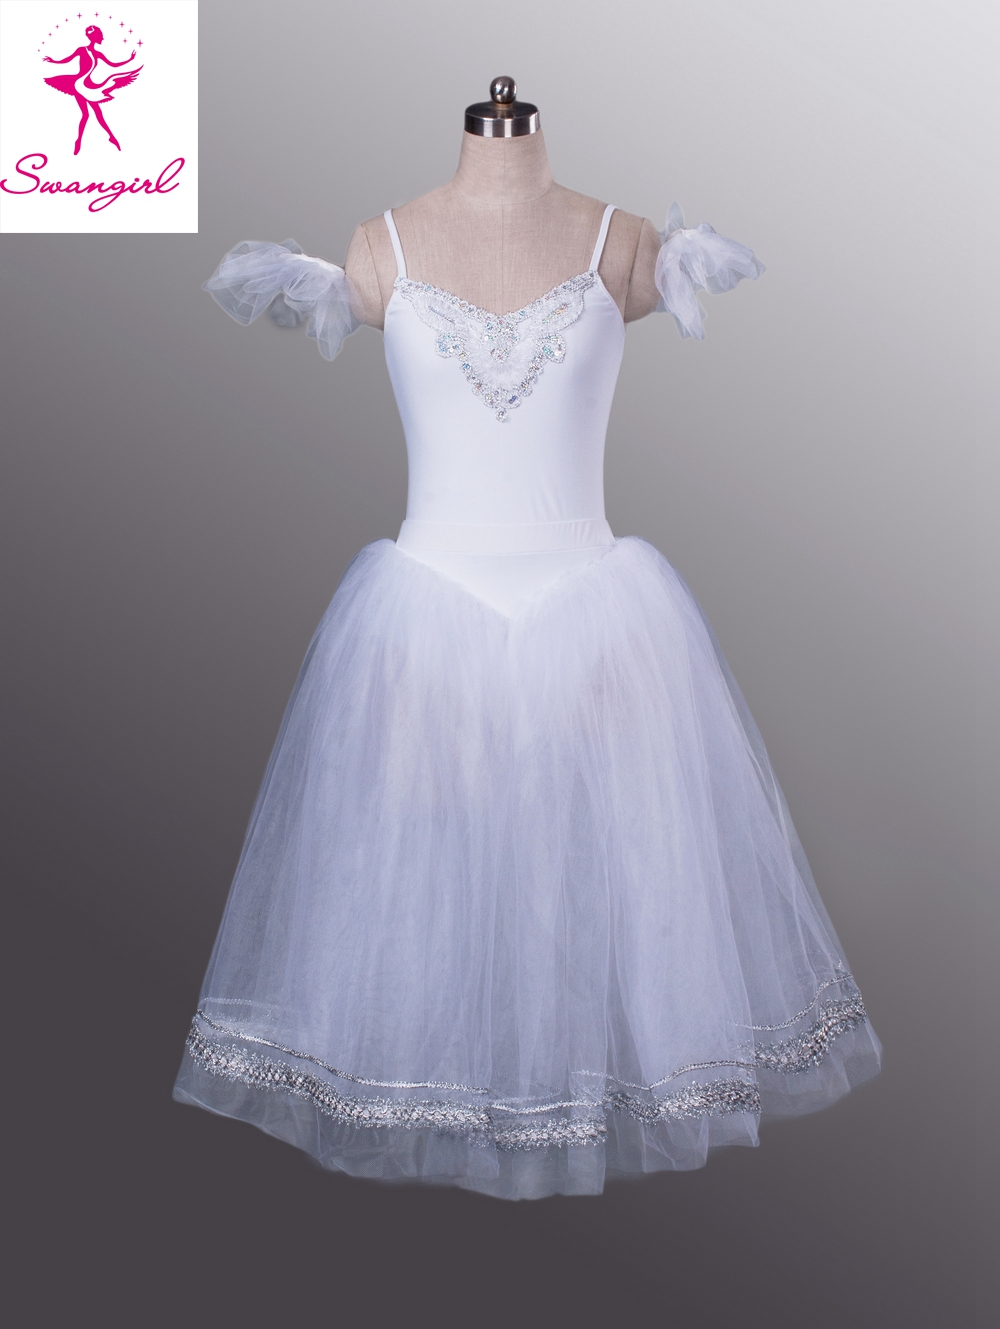 blue lyrical dance costumes